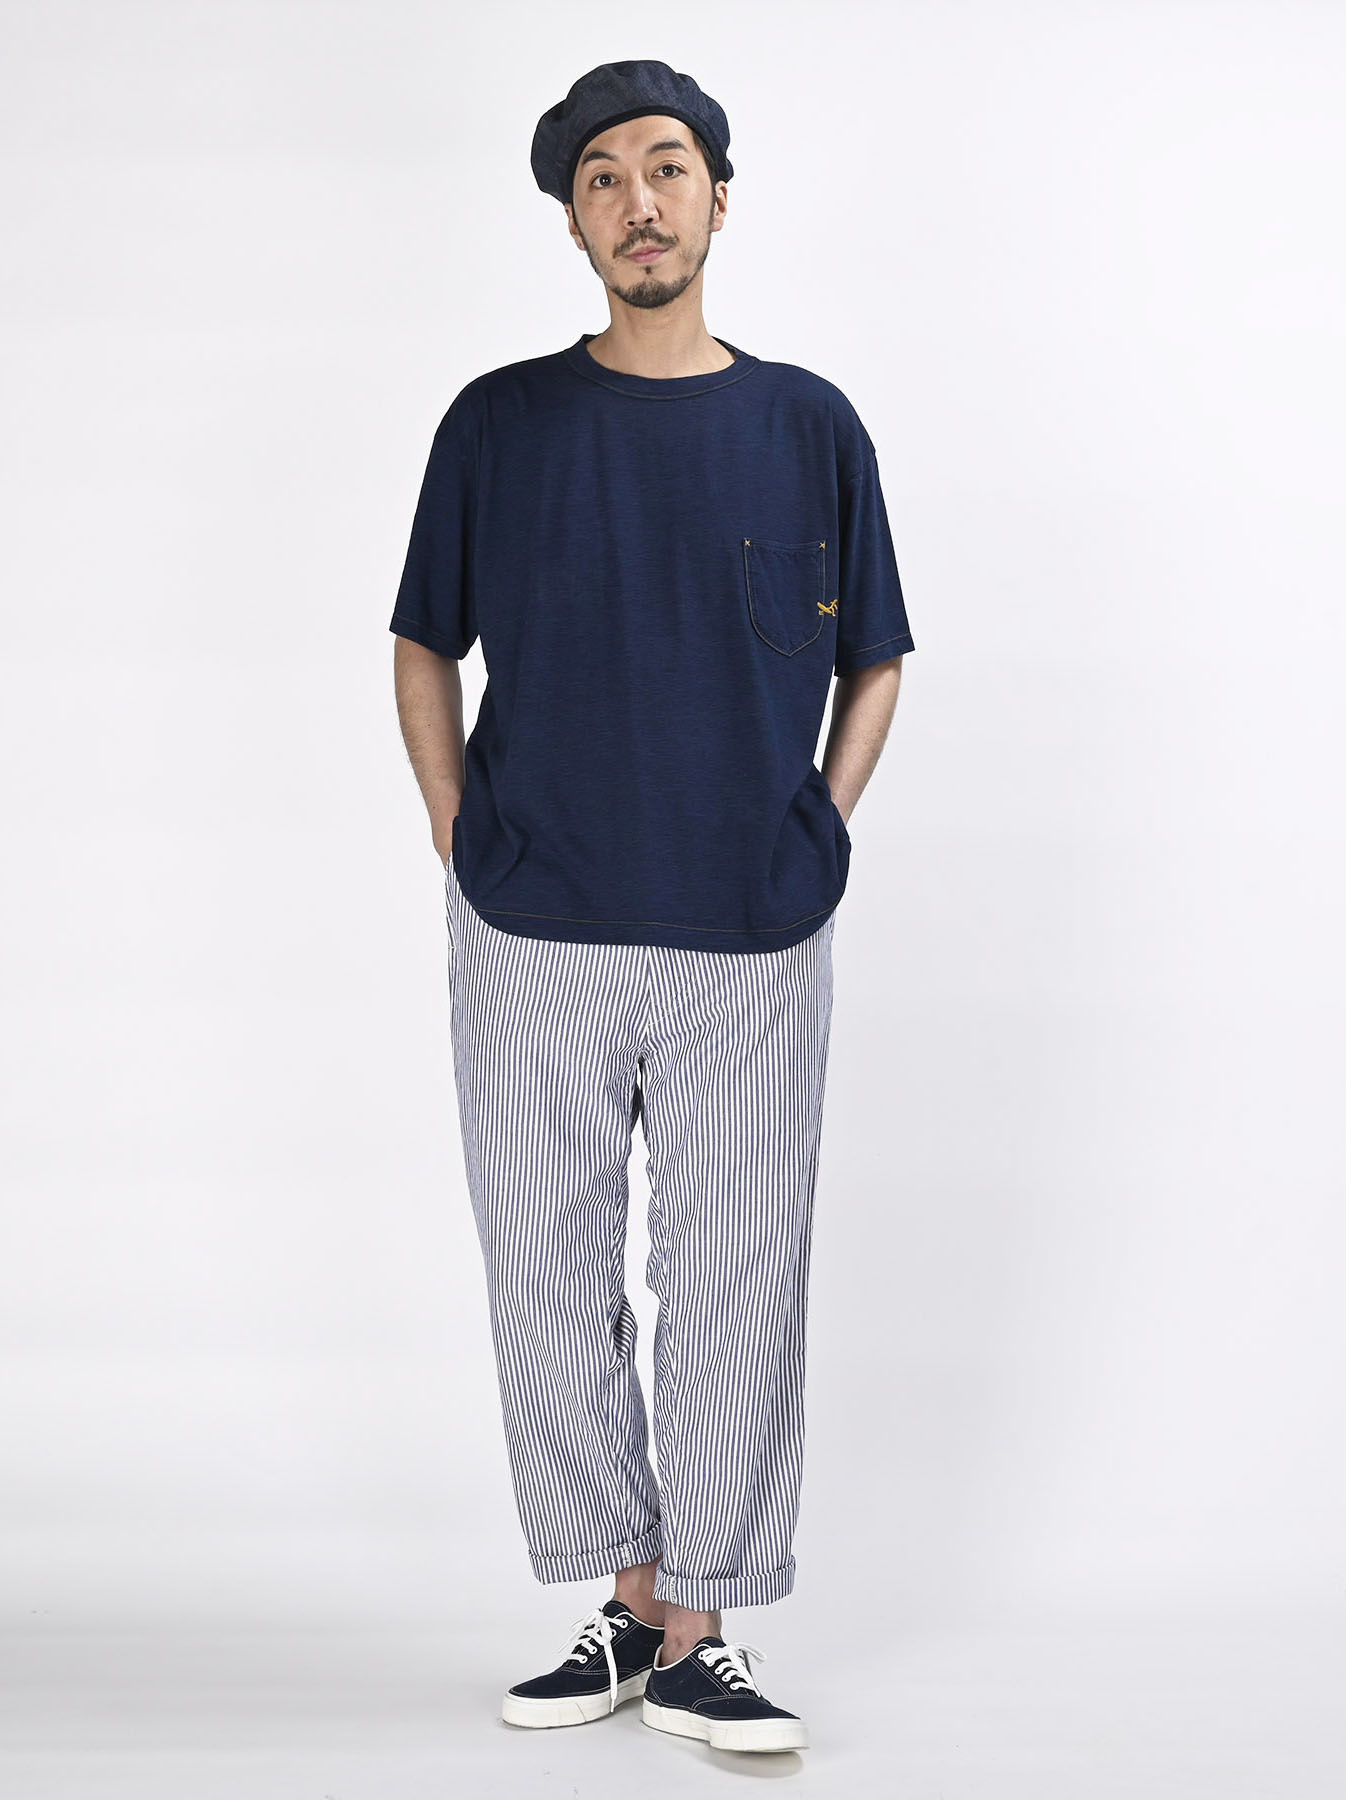 Indigo Hayama-kun Embroidered 908 Ocean T-shirt (0621)-2